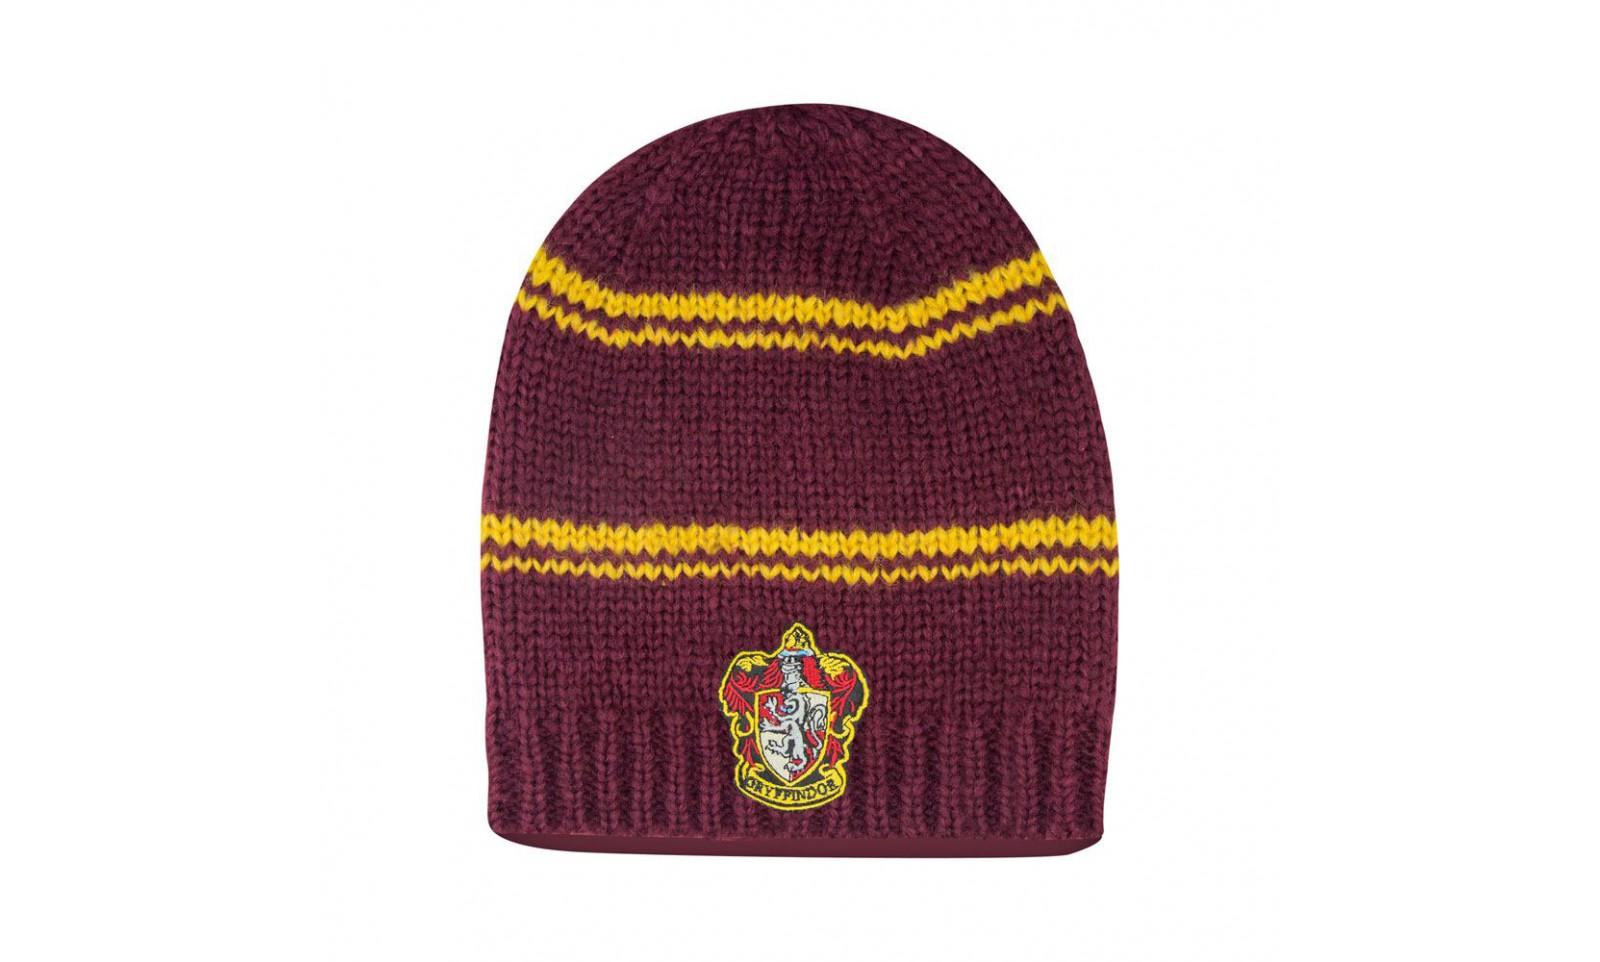 ddb461c78f1 Harry Potter - Gryffindor Slouchy Beanie - Movie film clothing